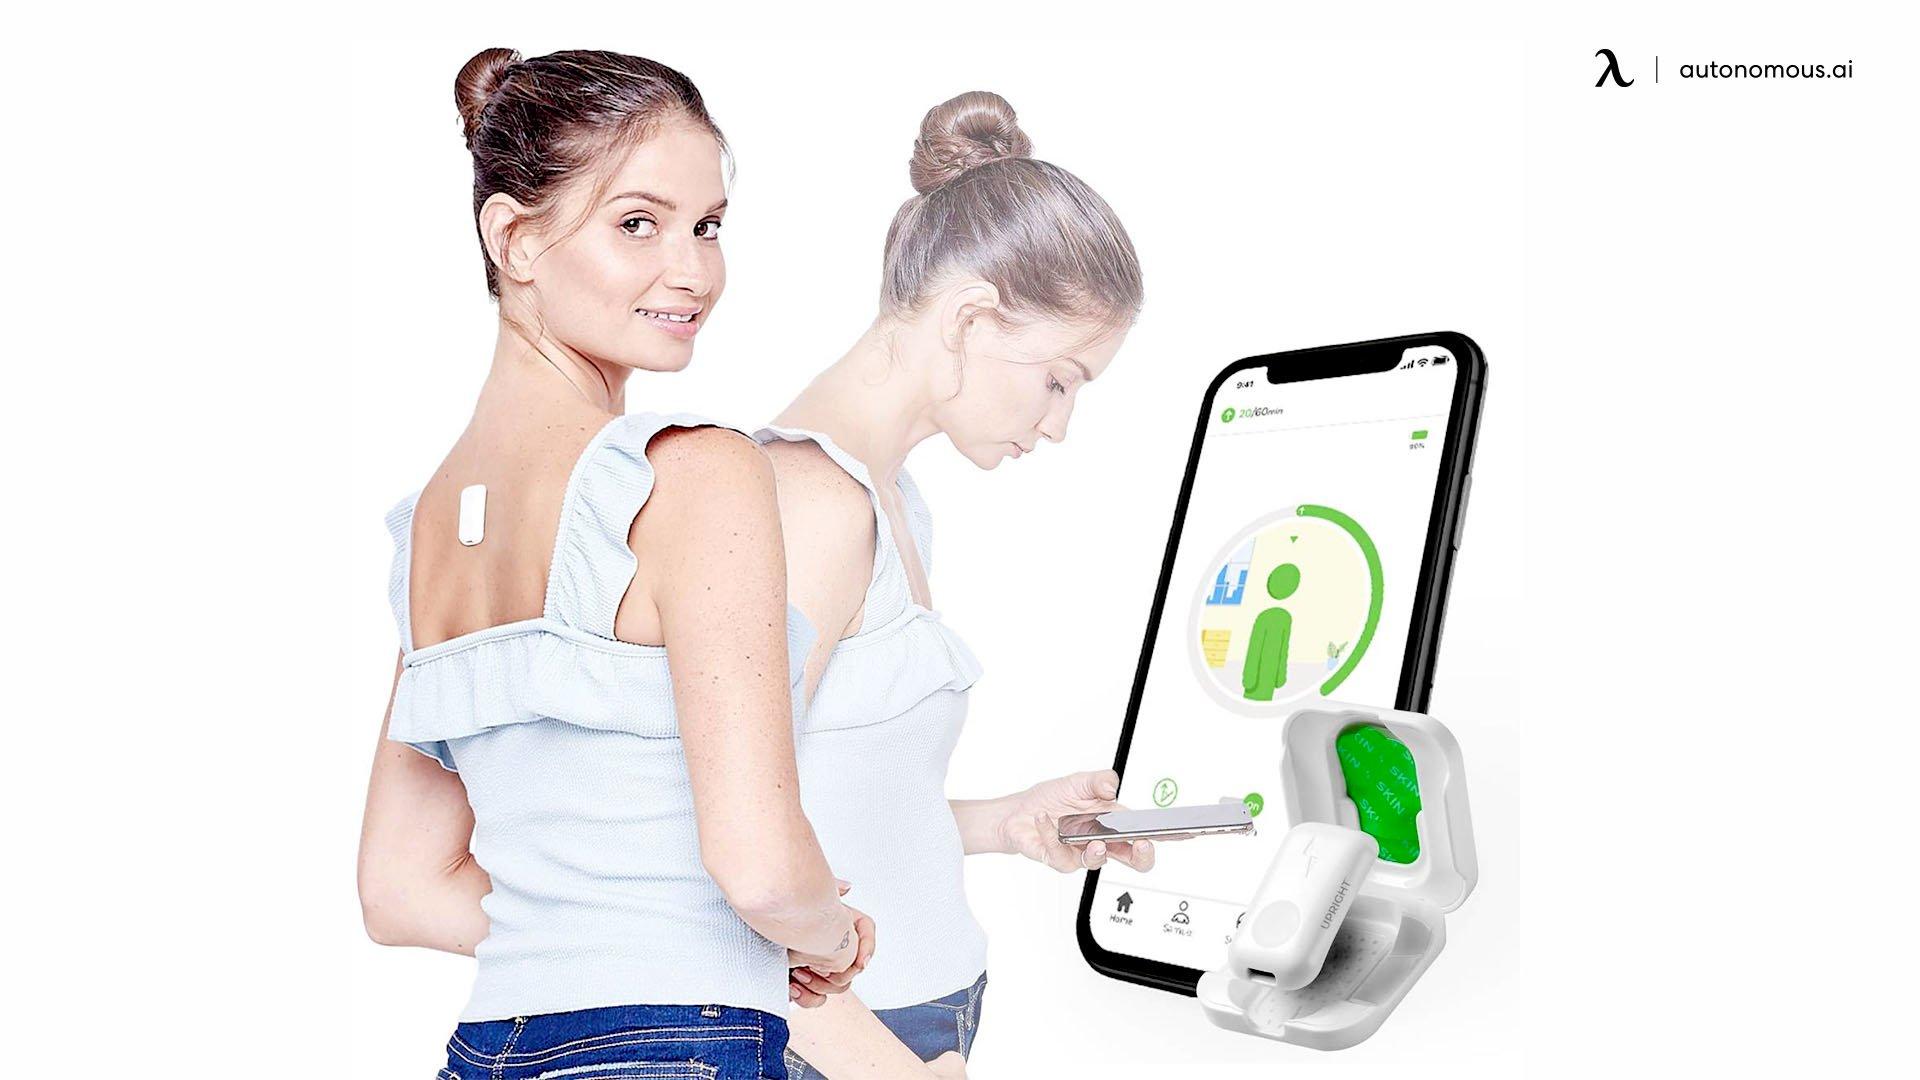 Upright Go- Posture Control